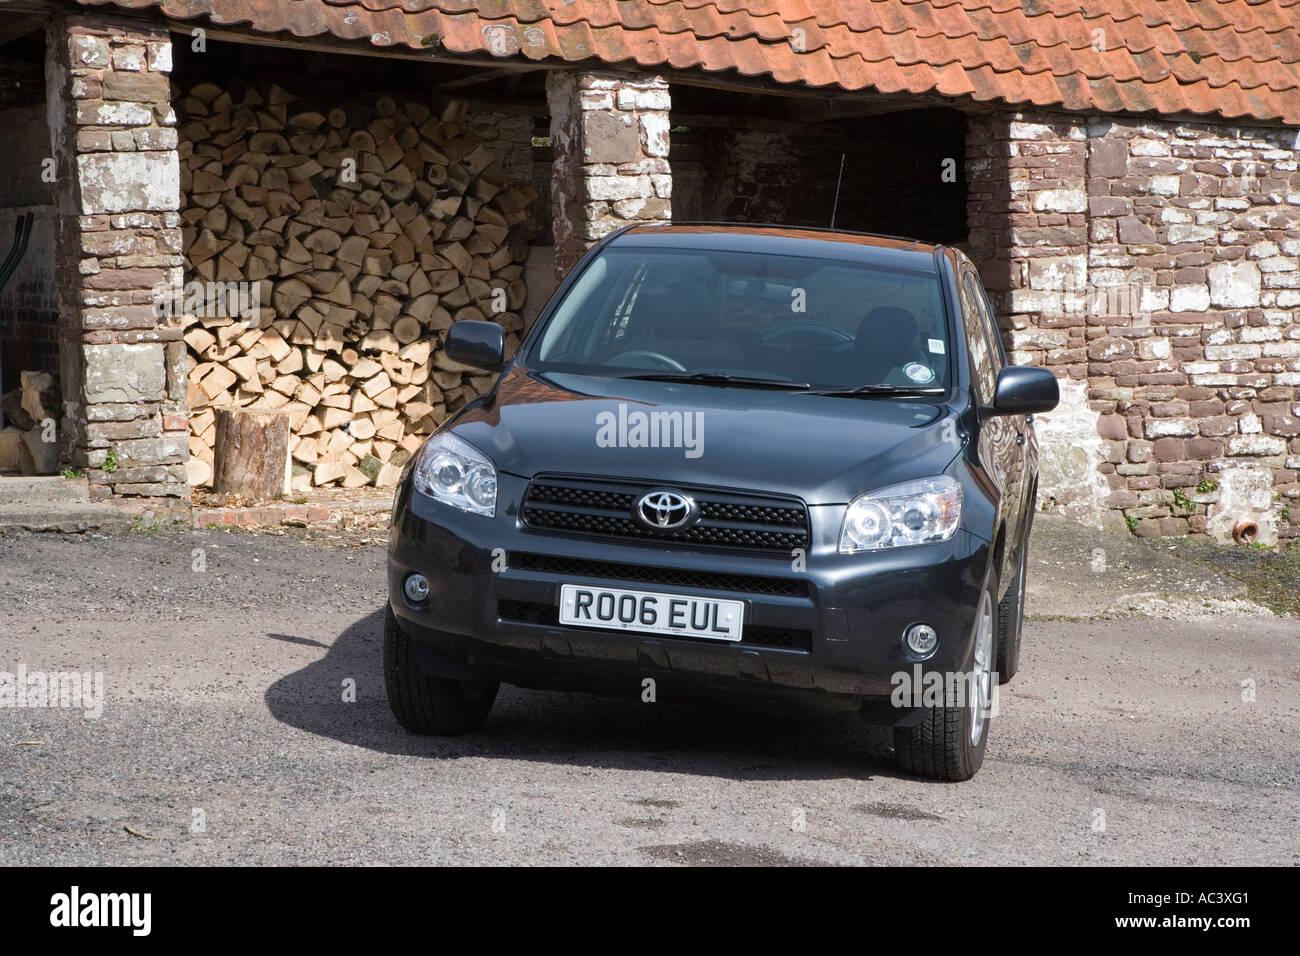 ECONOMICAL GREEN FRIENDLY 4 WHEEL DRIVE CAR SUV IN FARM YARD UK - Stock Image